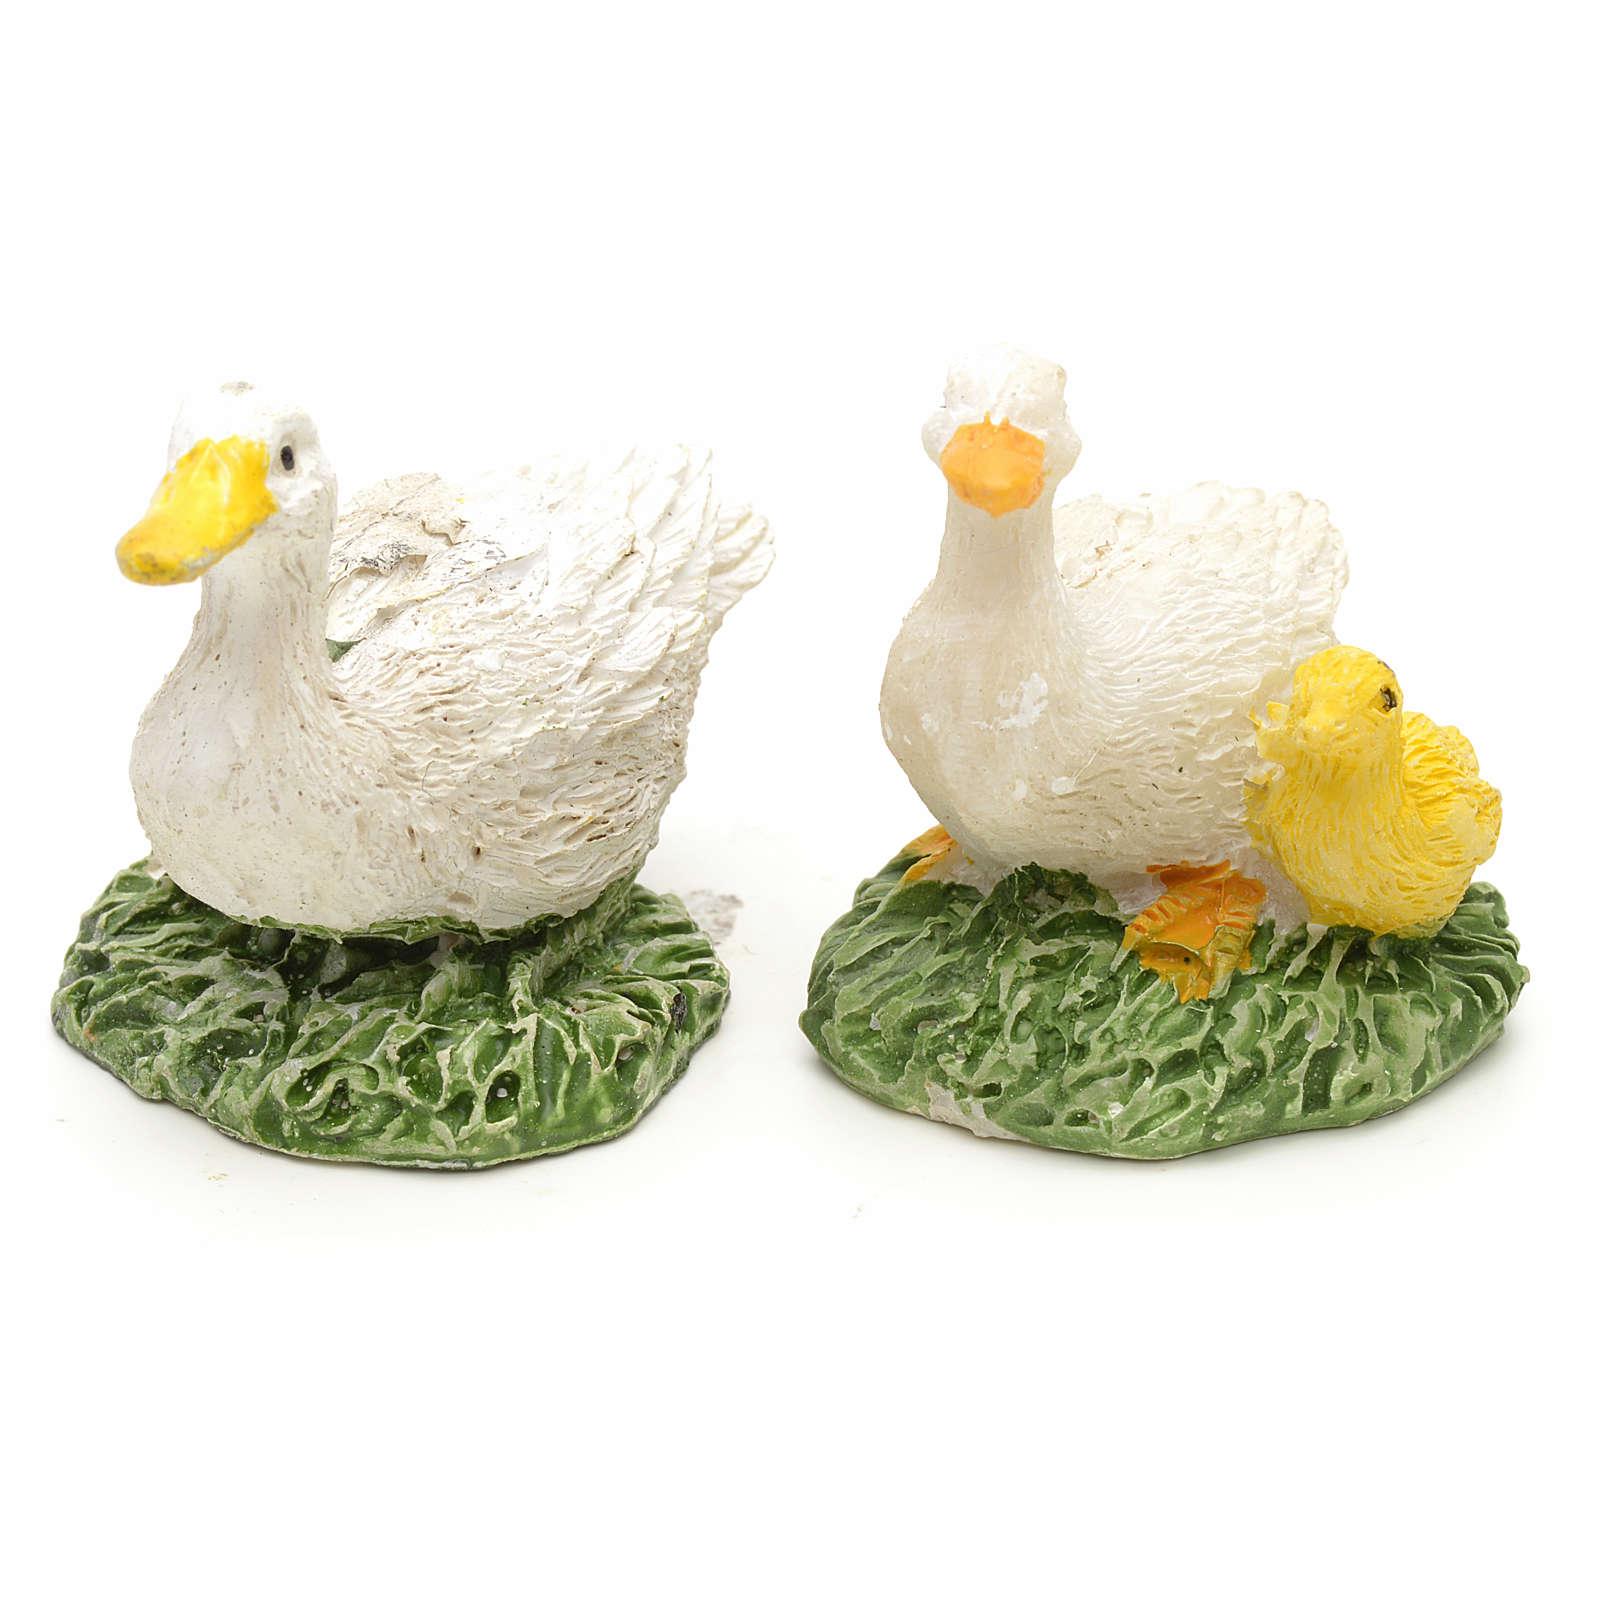 Patos en resina para pesebre ser 2pz de 2,5cm 3